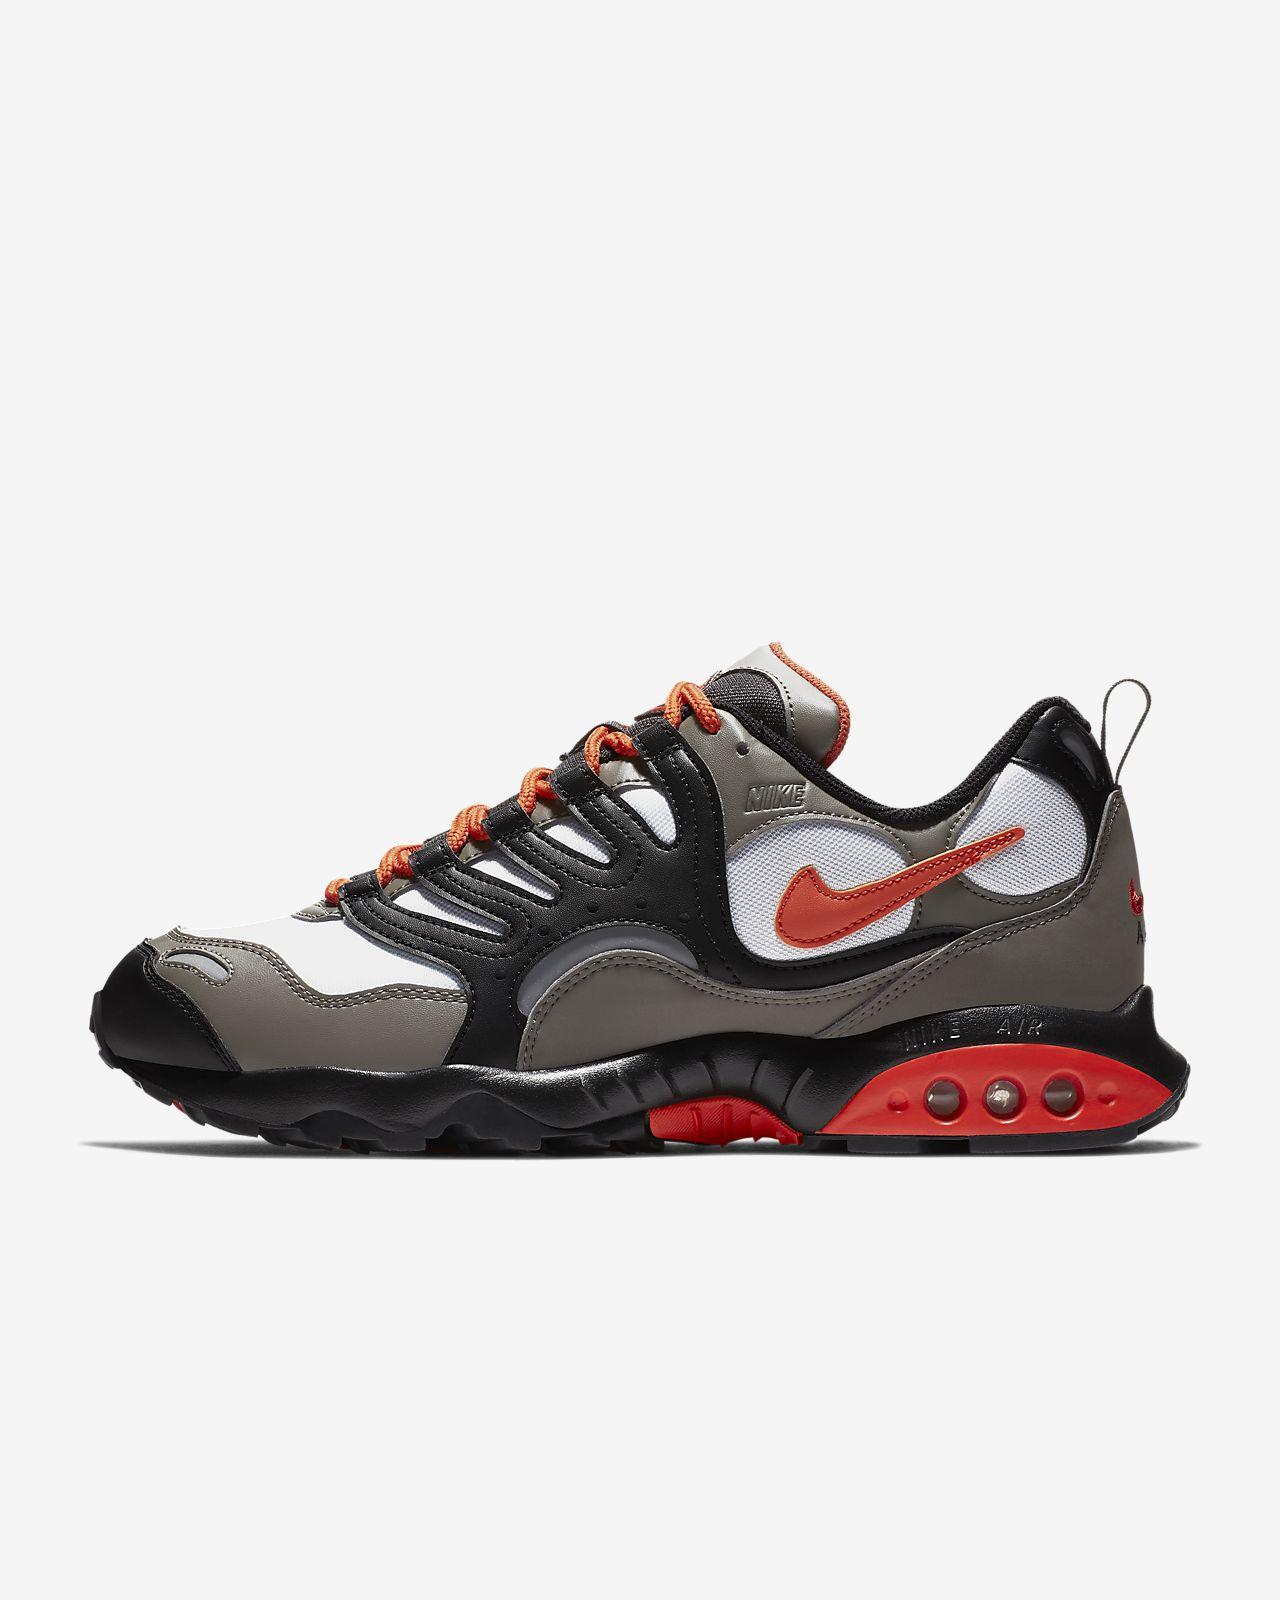 wholesale dealer fe05f 9cbed ... Calzado para hombre Nike Air Terra Humara 18